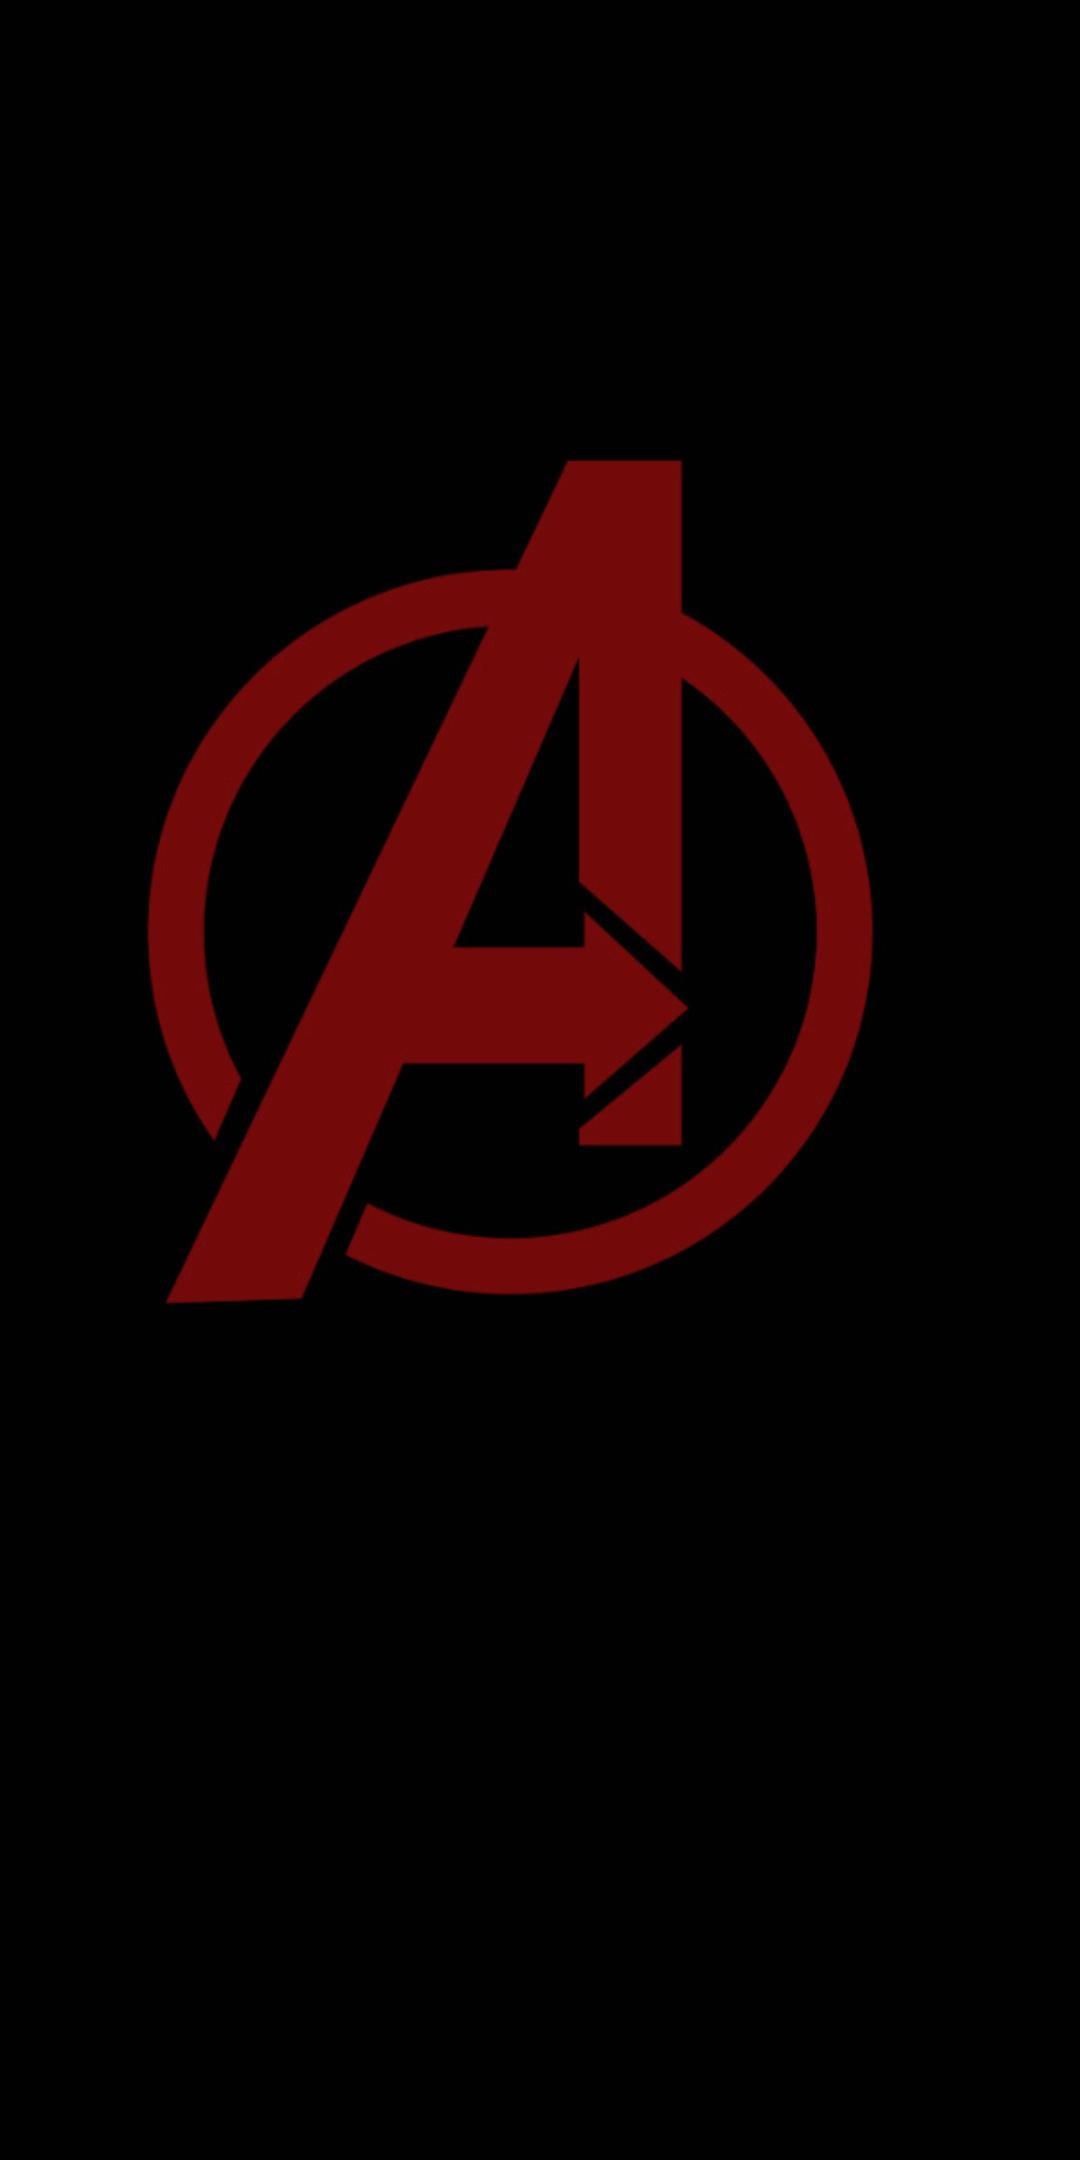 1080x2160 Avengers Minimal Logo One Plus 5t Honor 7x Honor View 10